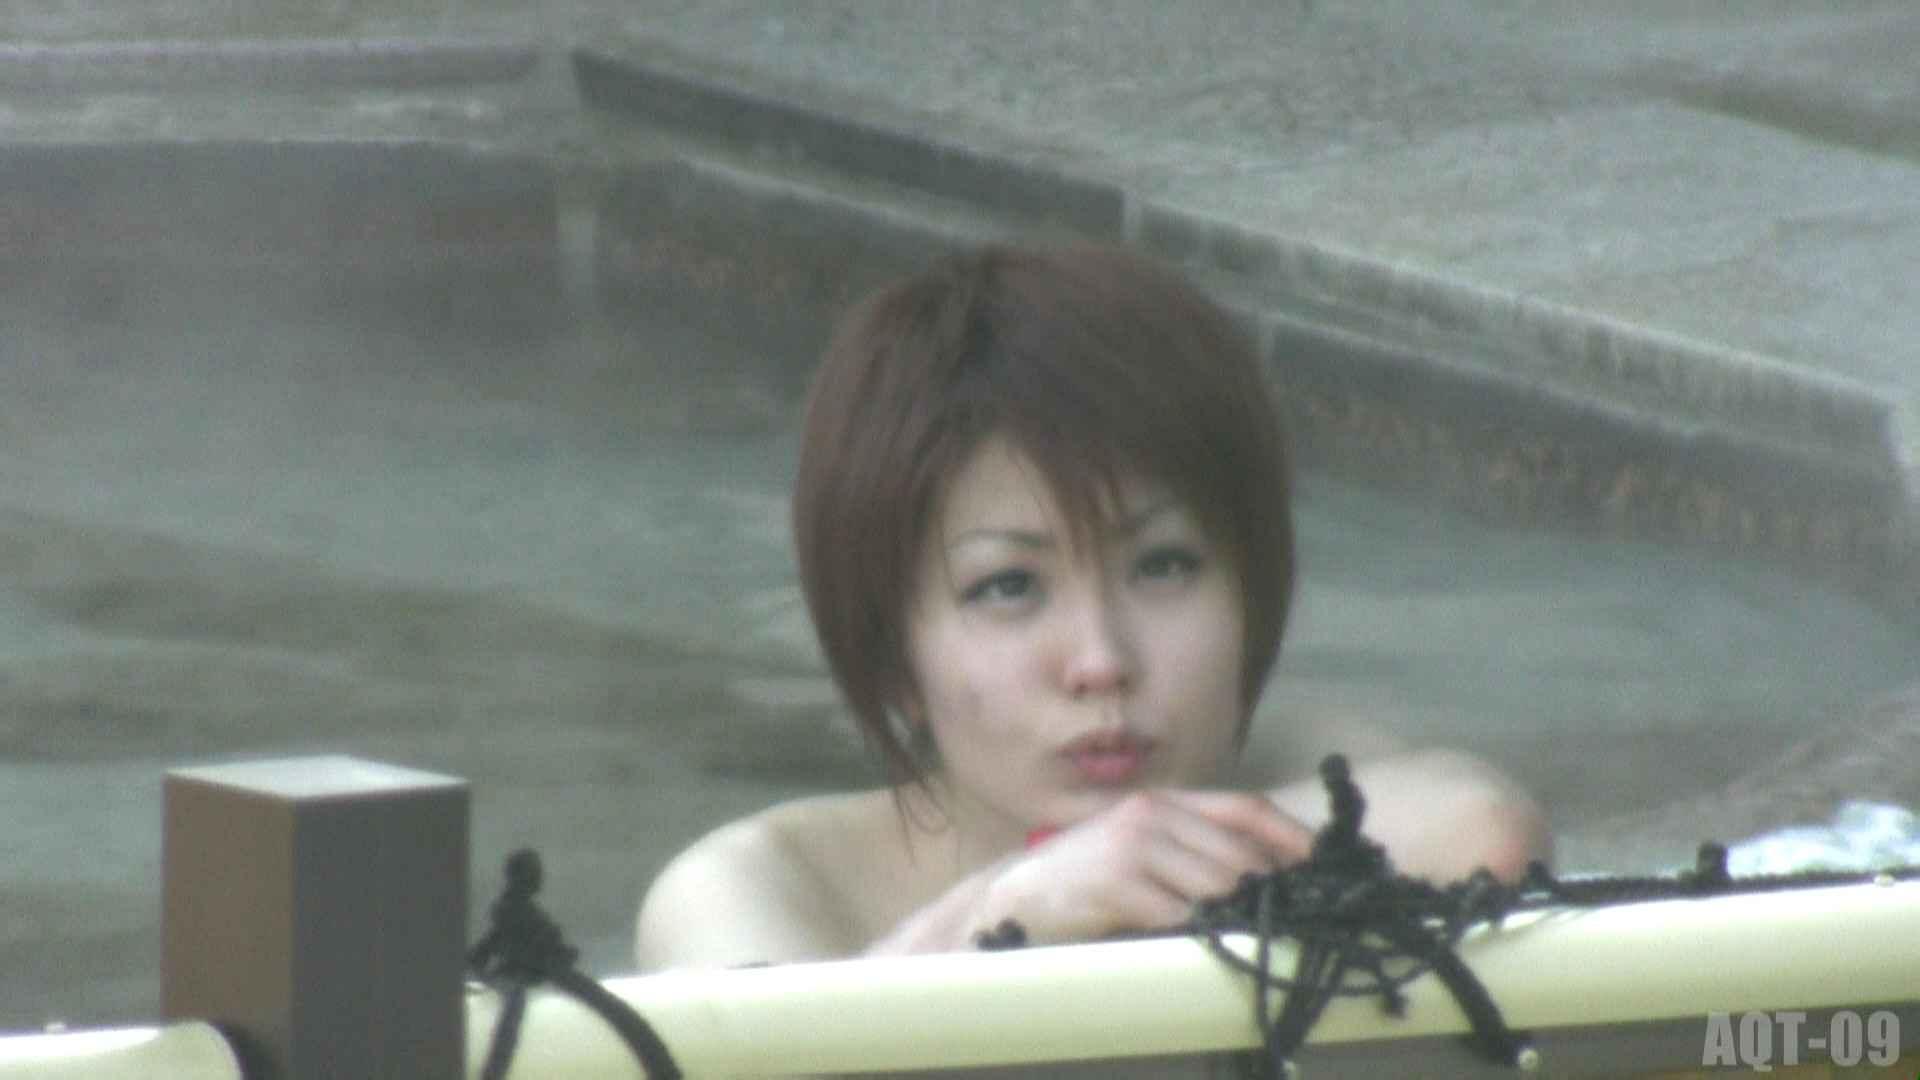 Aquaな露天風呂Vol.779 盗撮 SEX無修正画像 81連発 32